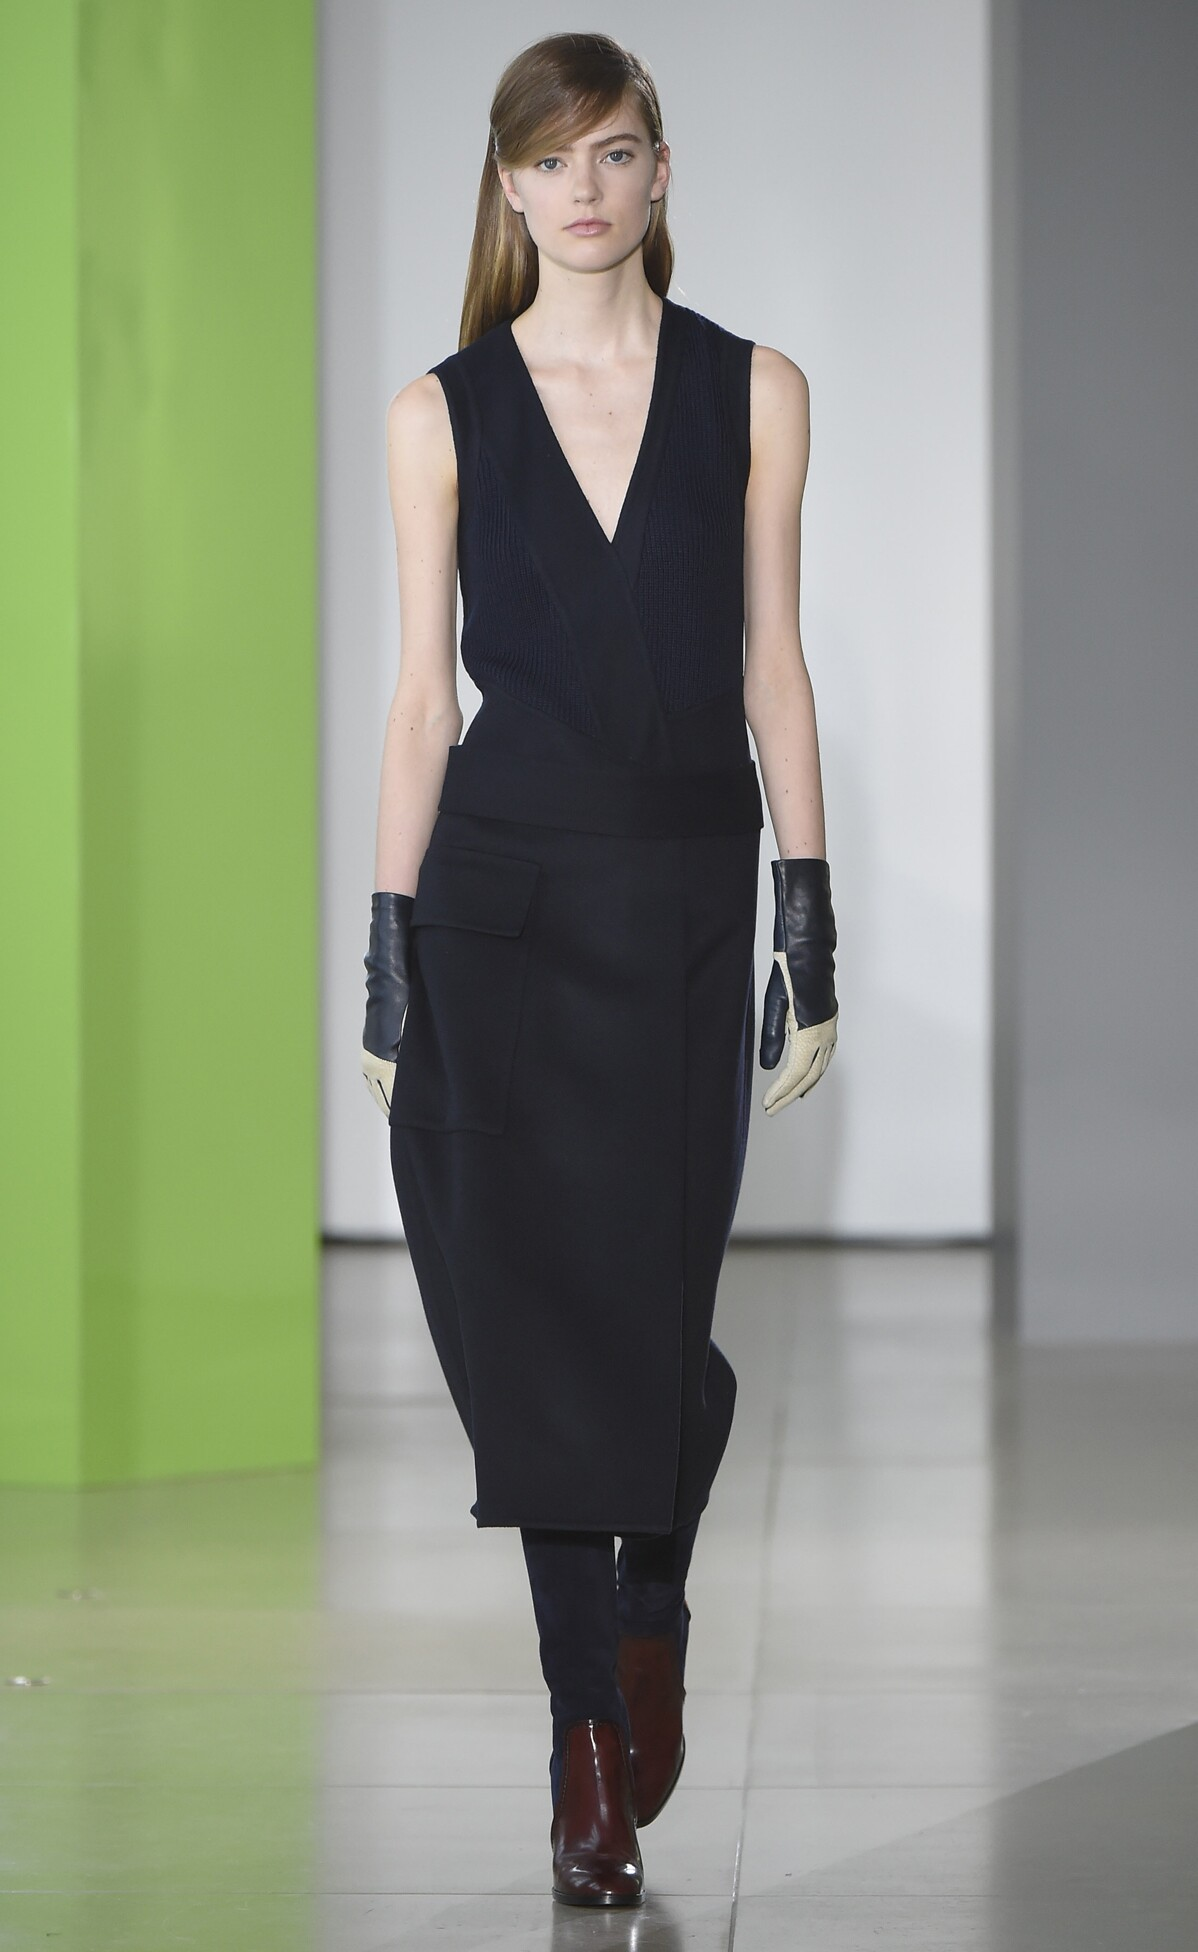 Jil Sander Women's Collection 2015 2016